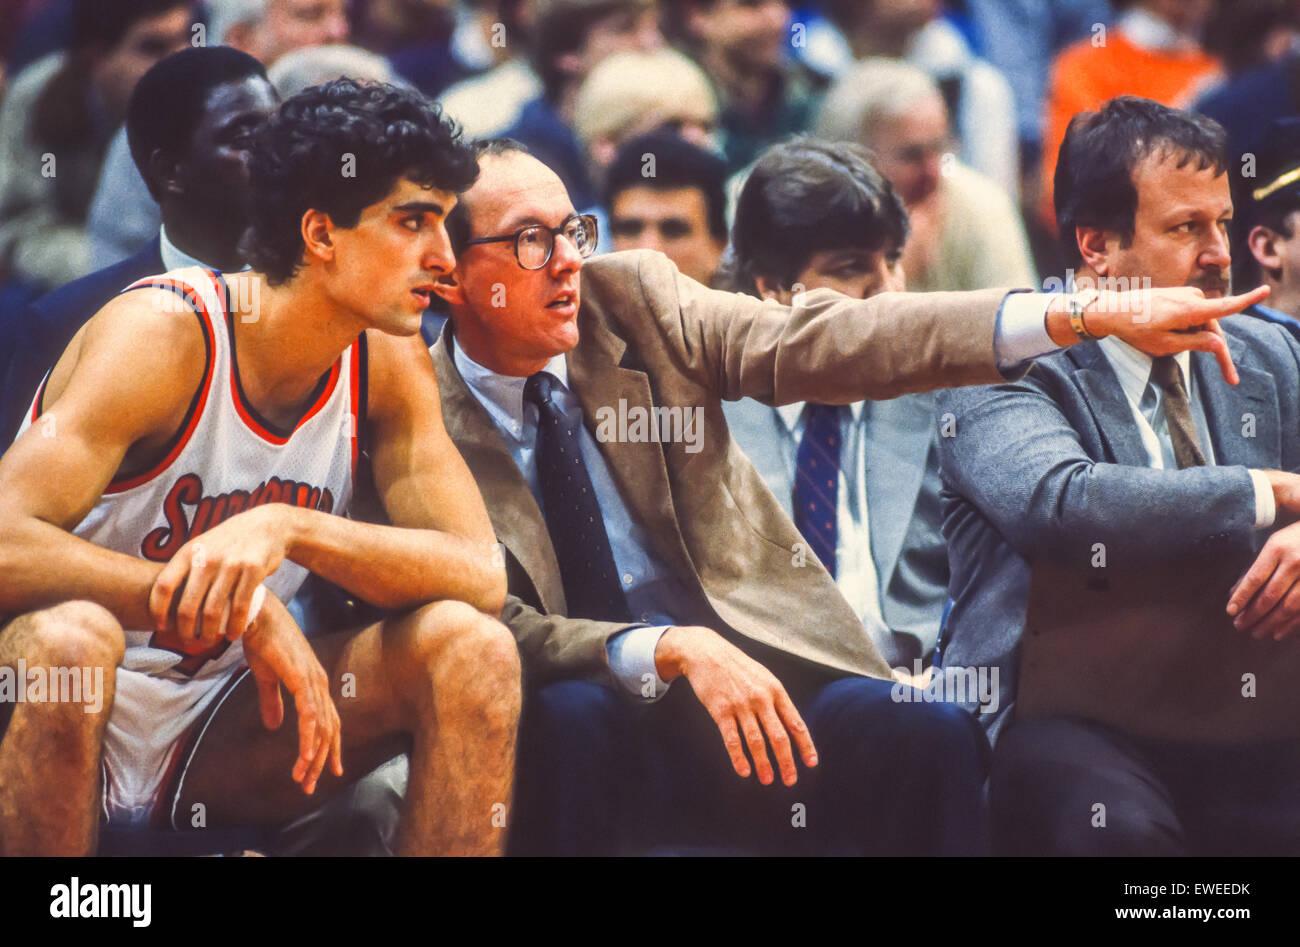 SYRACUSE NEW YORK USA Coach Jim Boeheim talks to player Rony